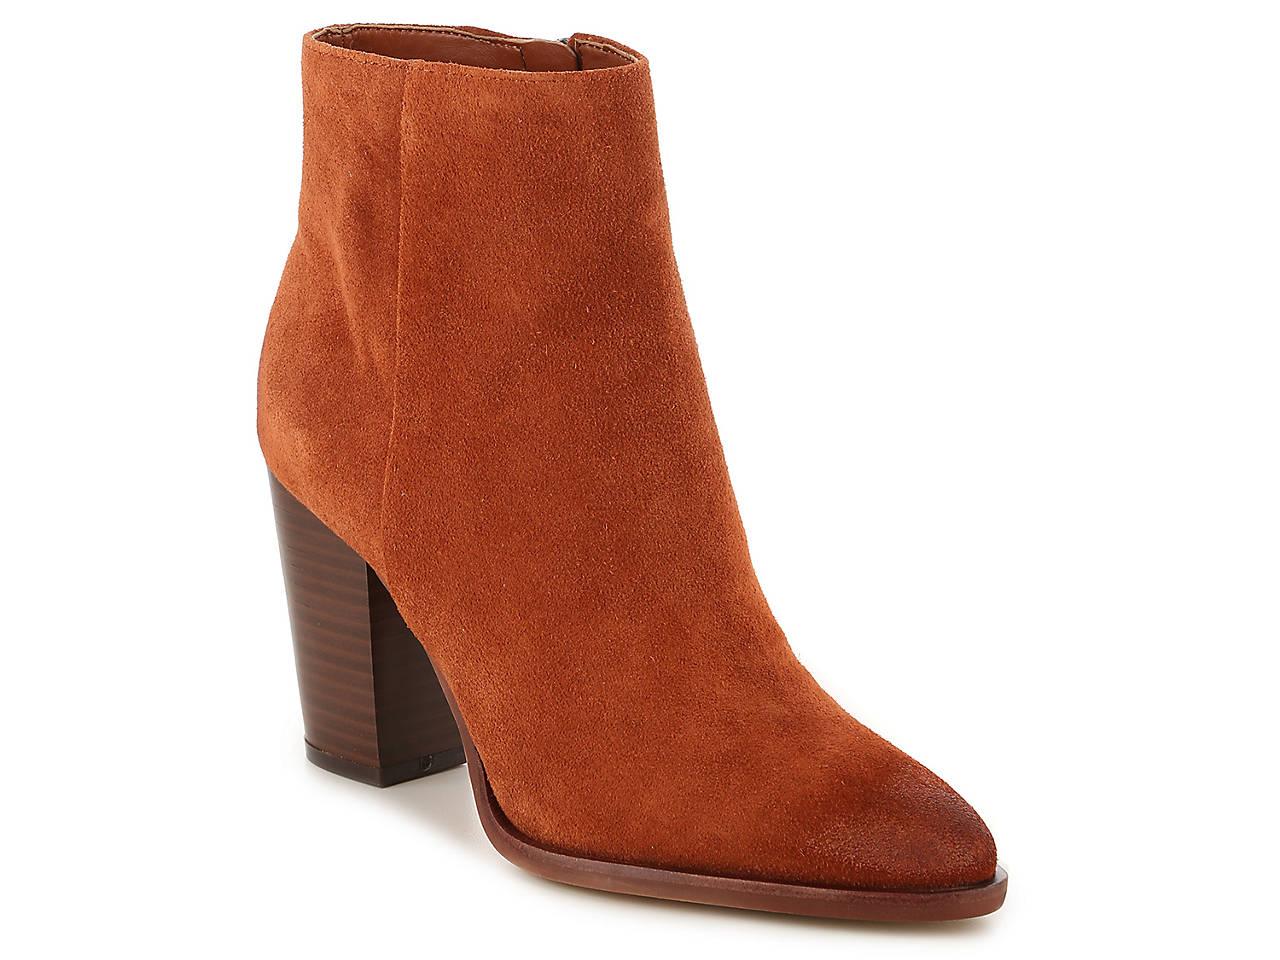 350952c2189a4 ... Sam Edelman Blake Bootie Women s Shoes DSW get new 18378 e0ae9 ...